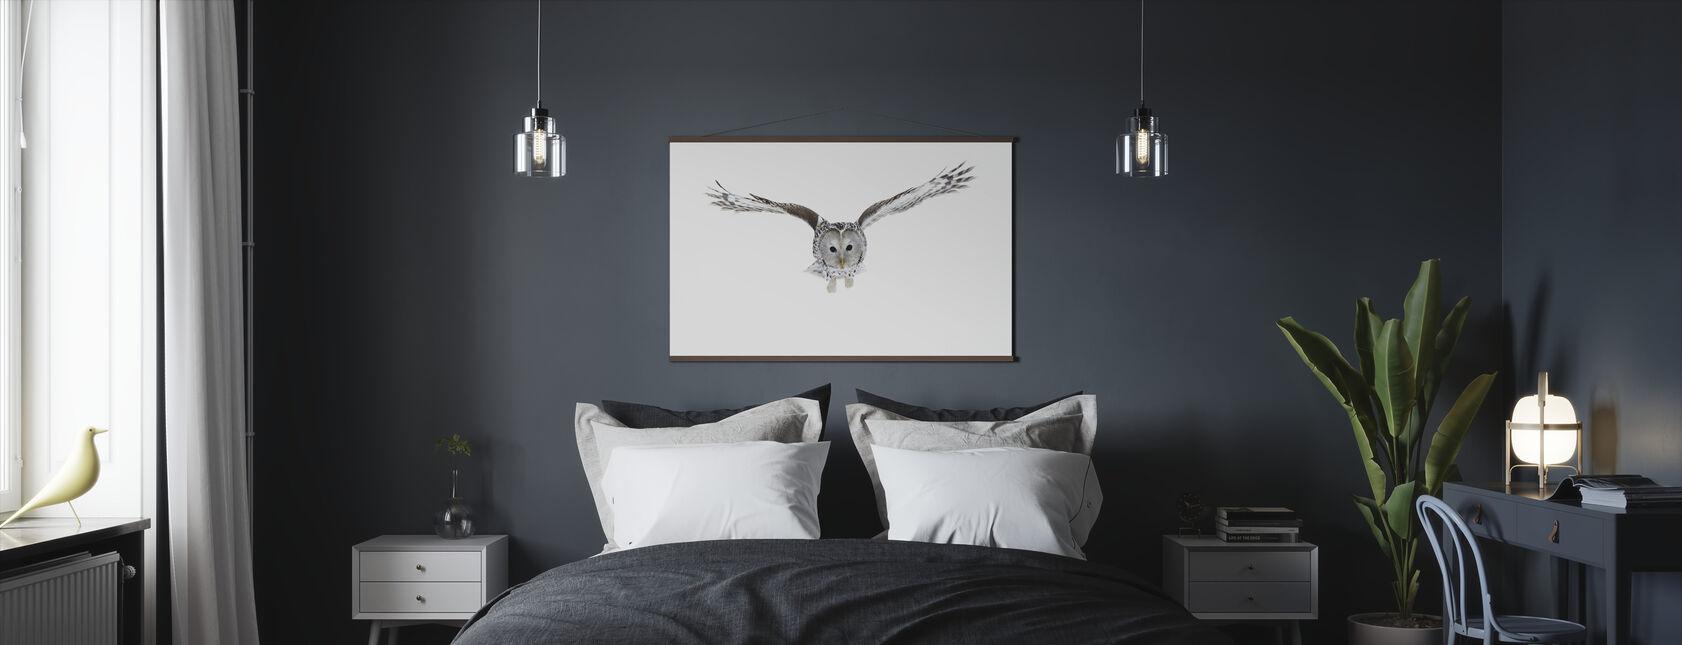 Flying Owl - Poster - Bedroom